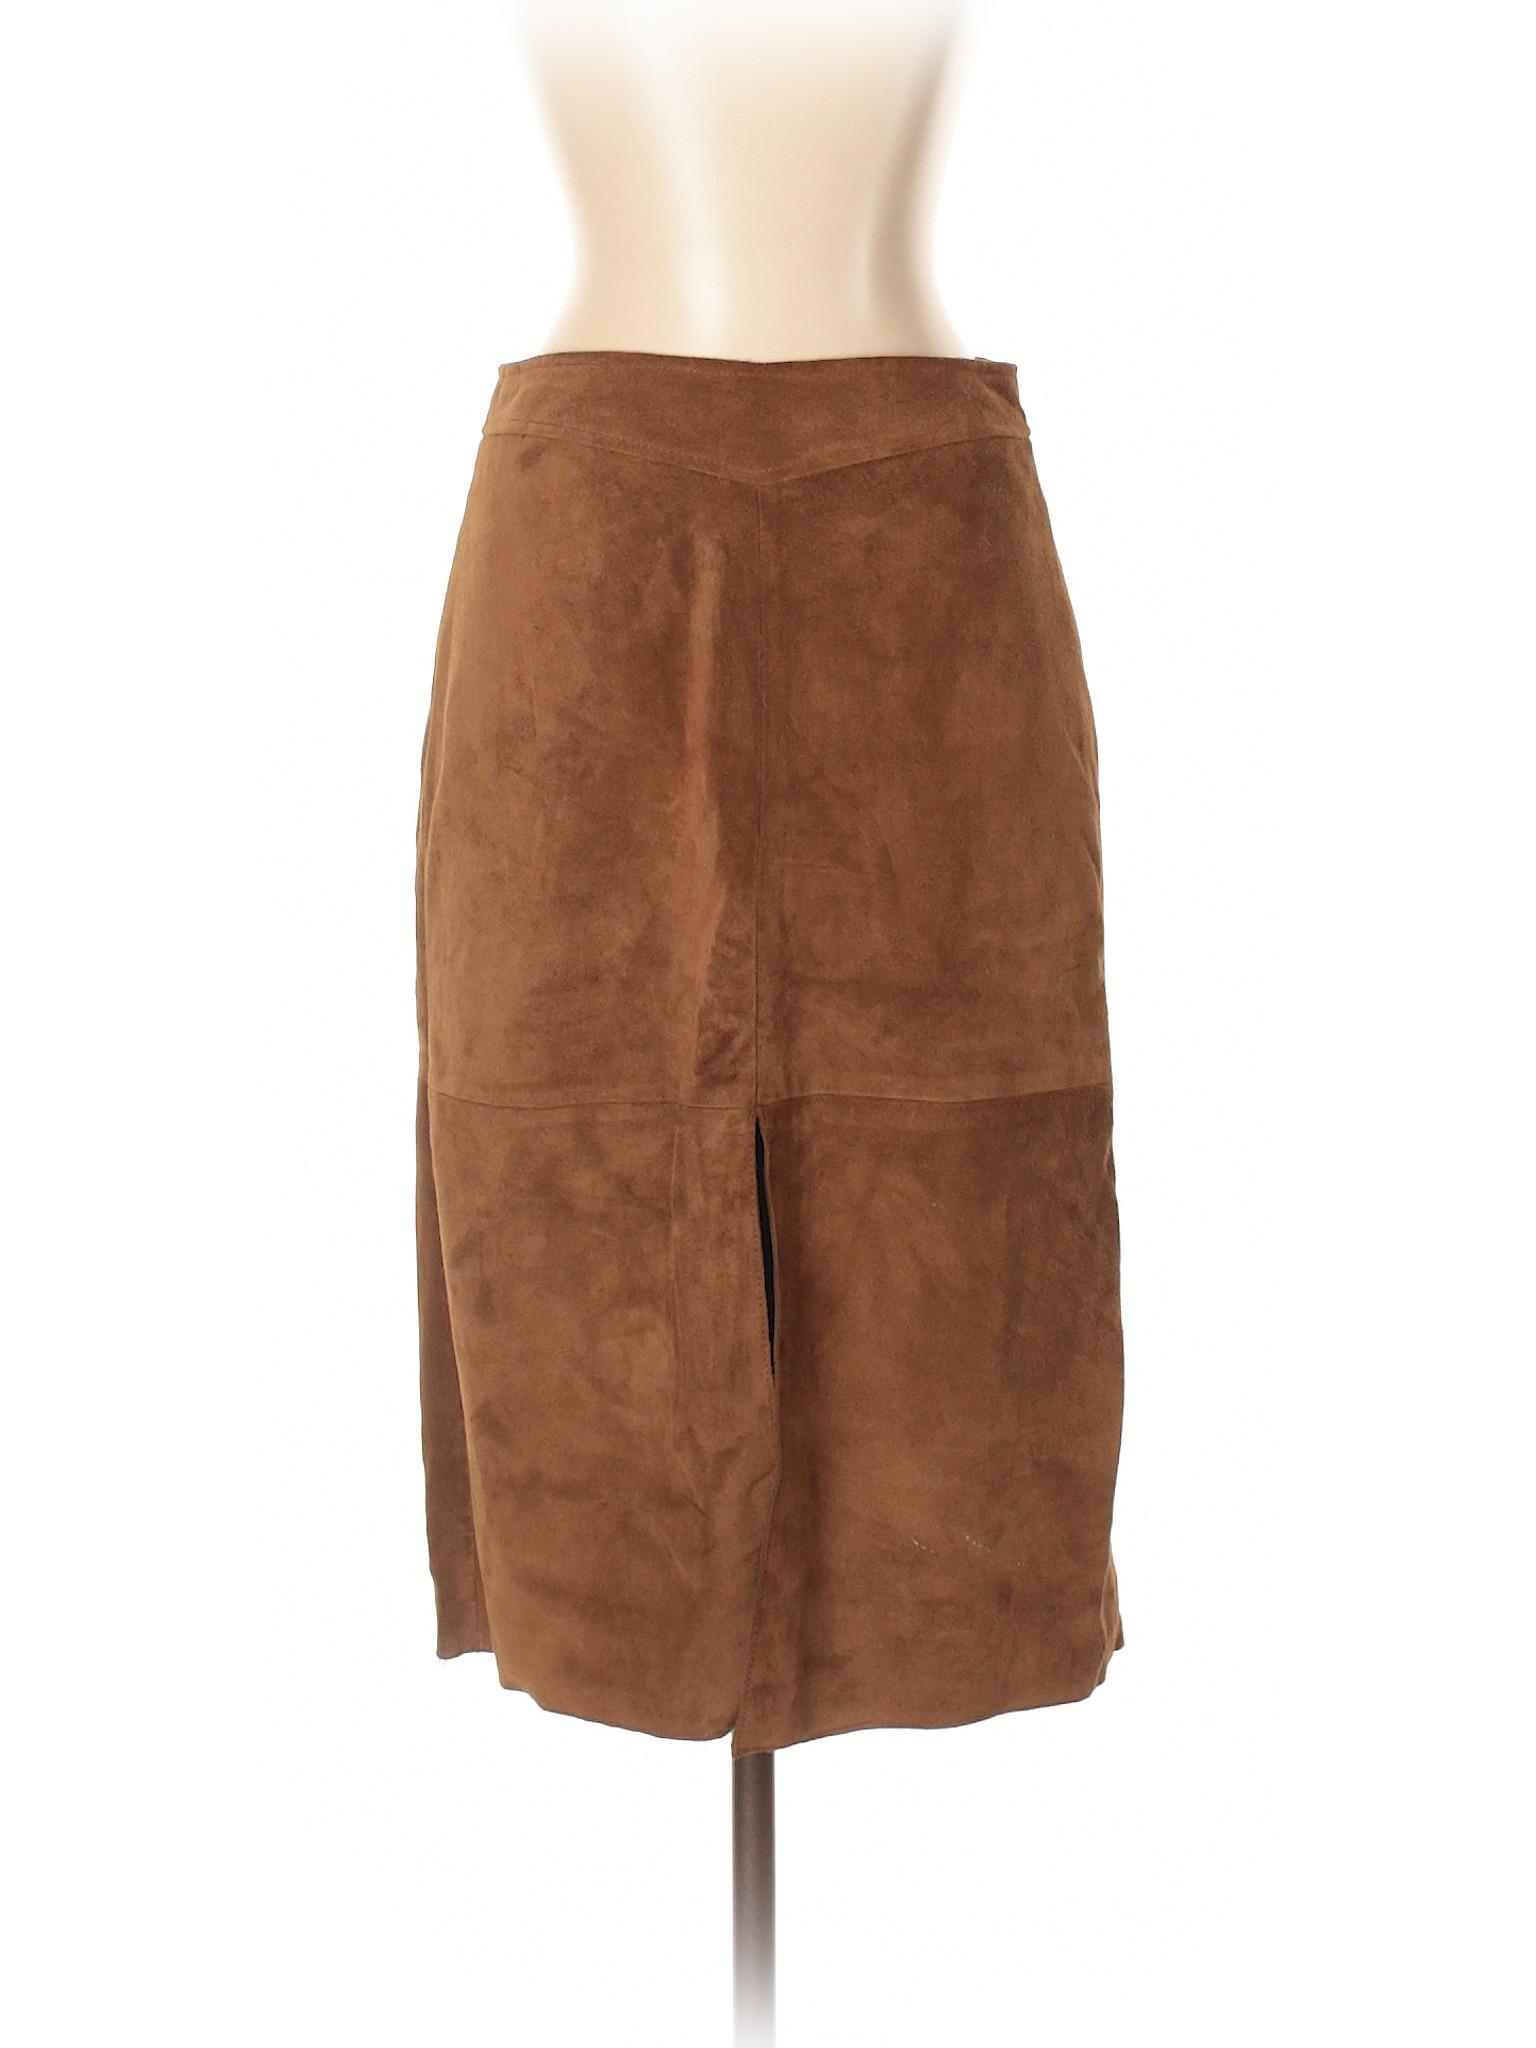 Casual Leisure Banana Skirt Republic winter gwg6xtBqA